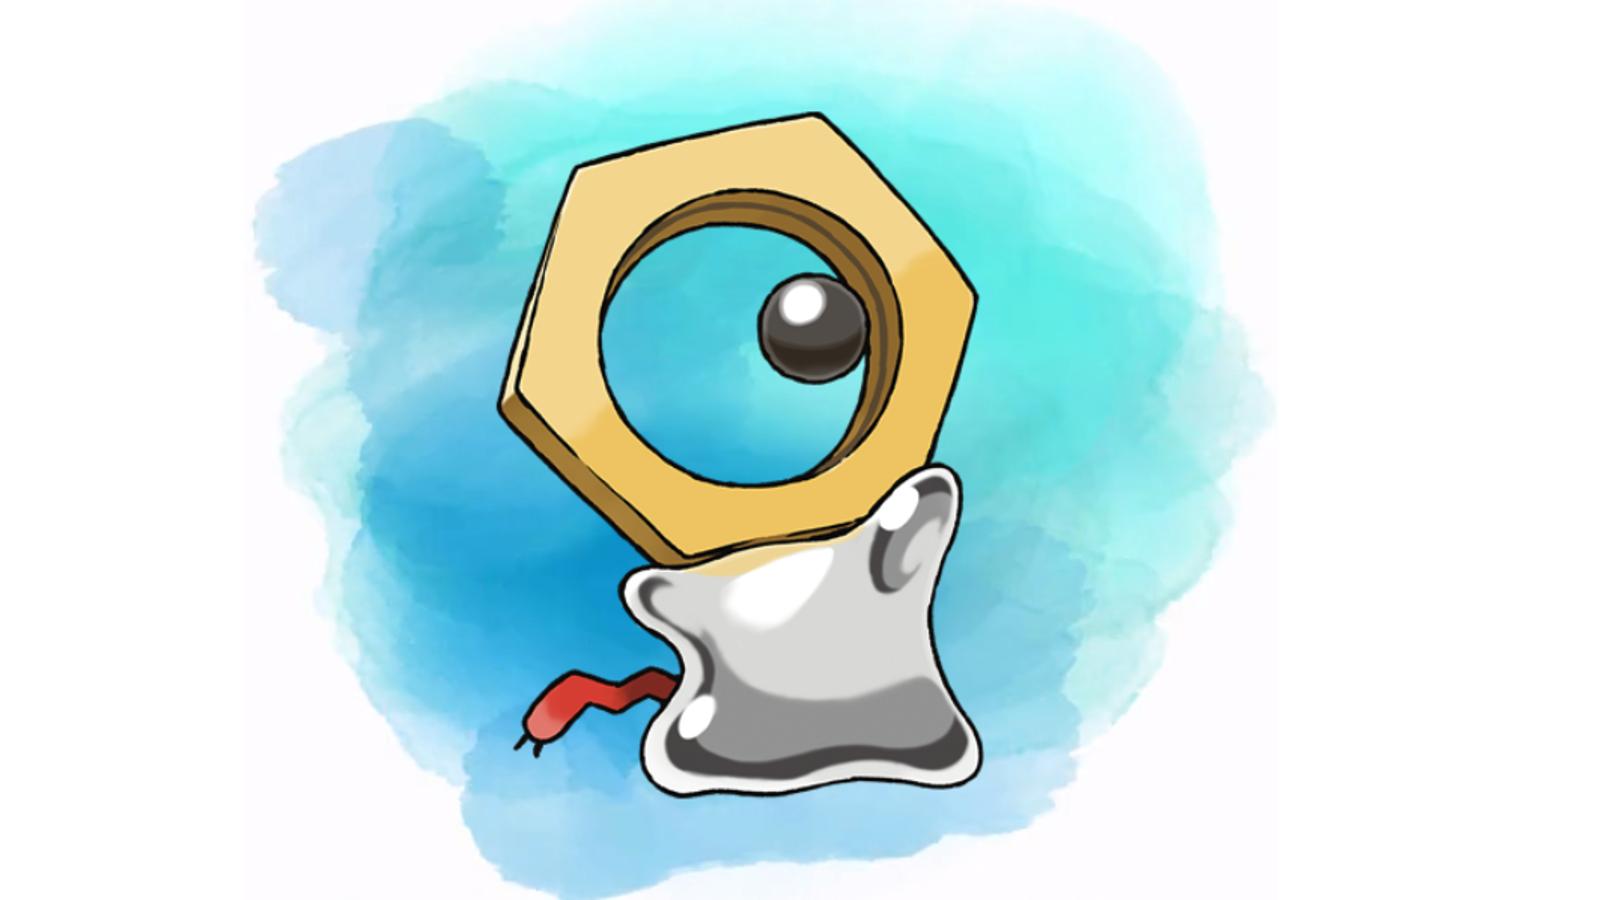 That Mysterious New Pokémon Finally Has A Name: Meltan